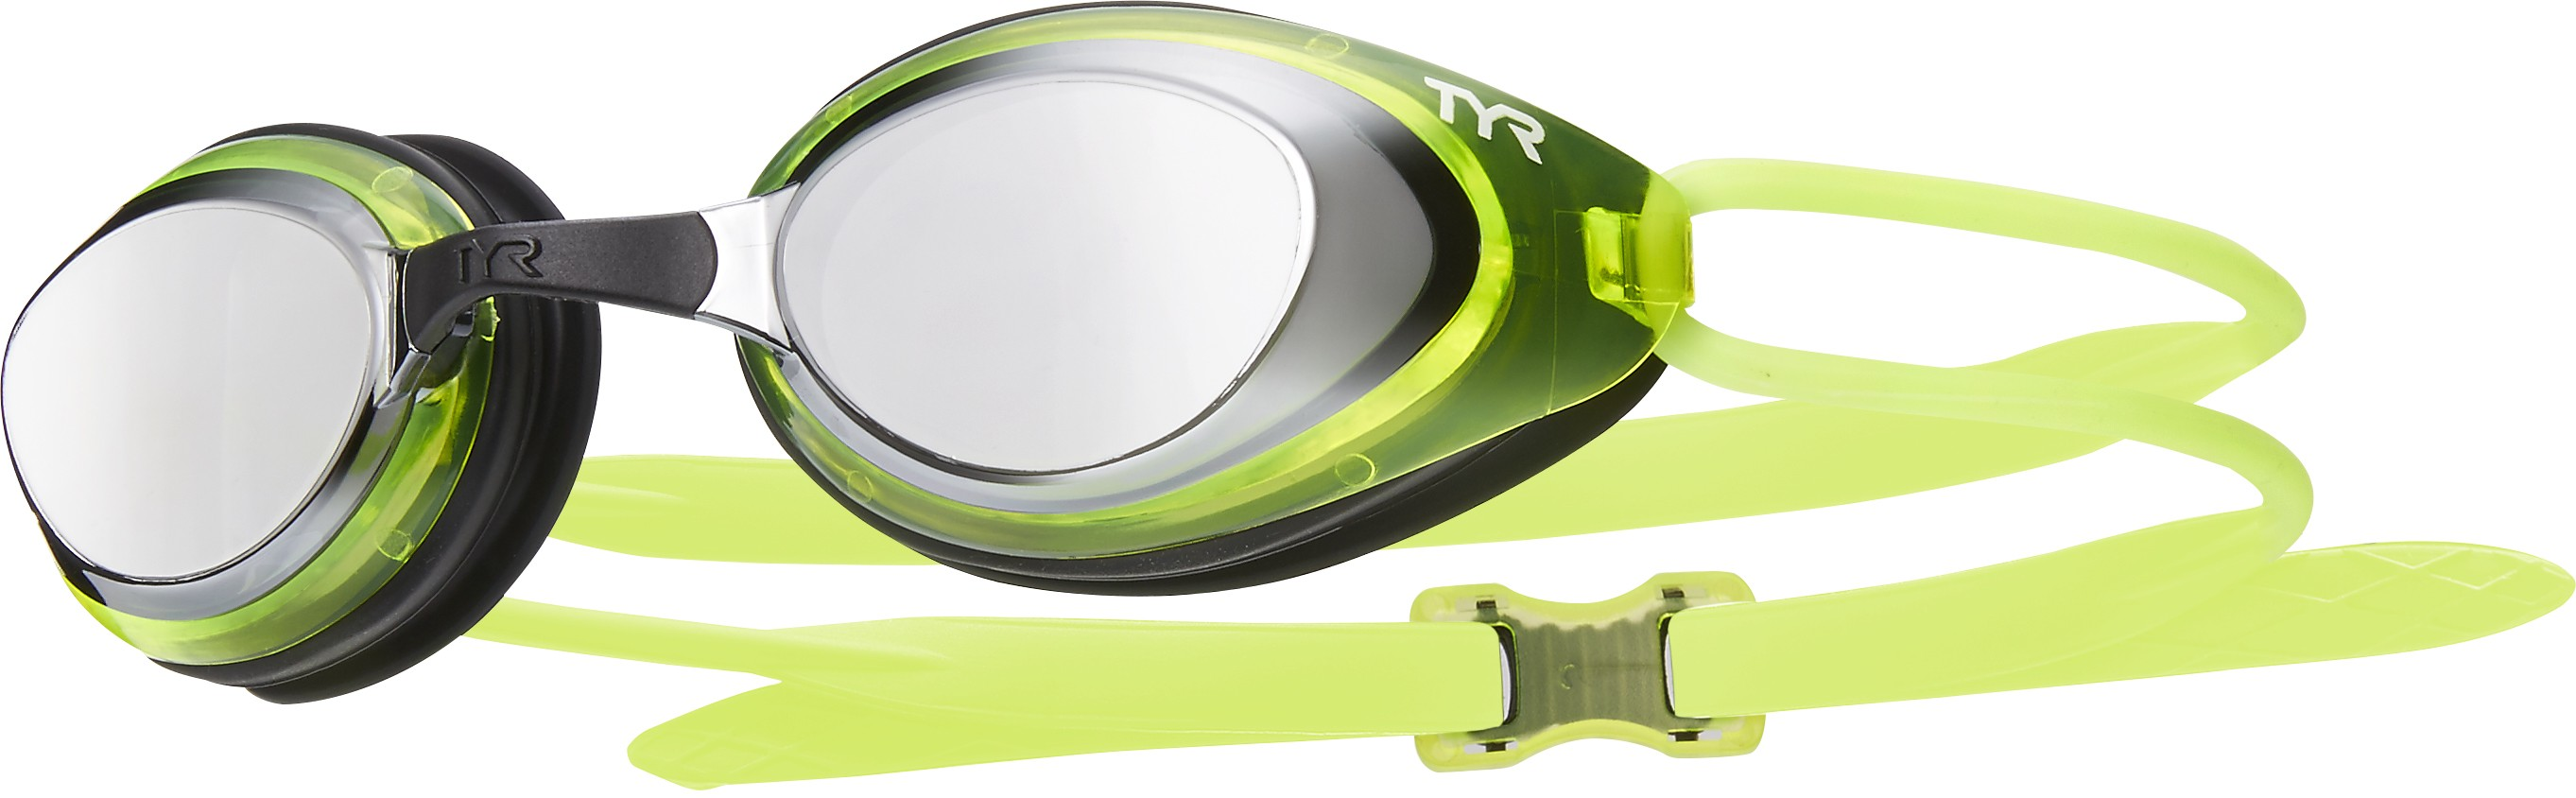 4a226bae115 TYR Blackhawk Racing Polarized Swim Goggles ...